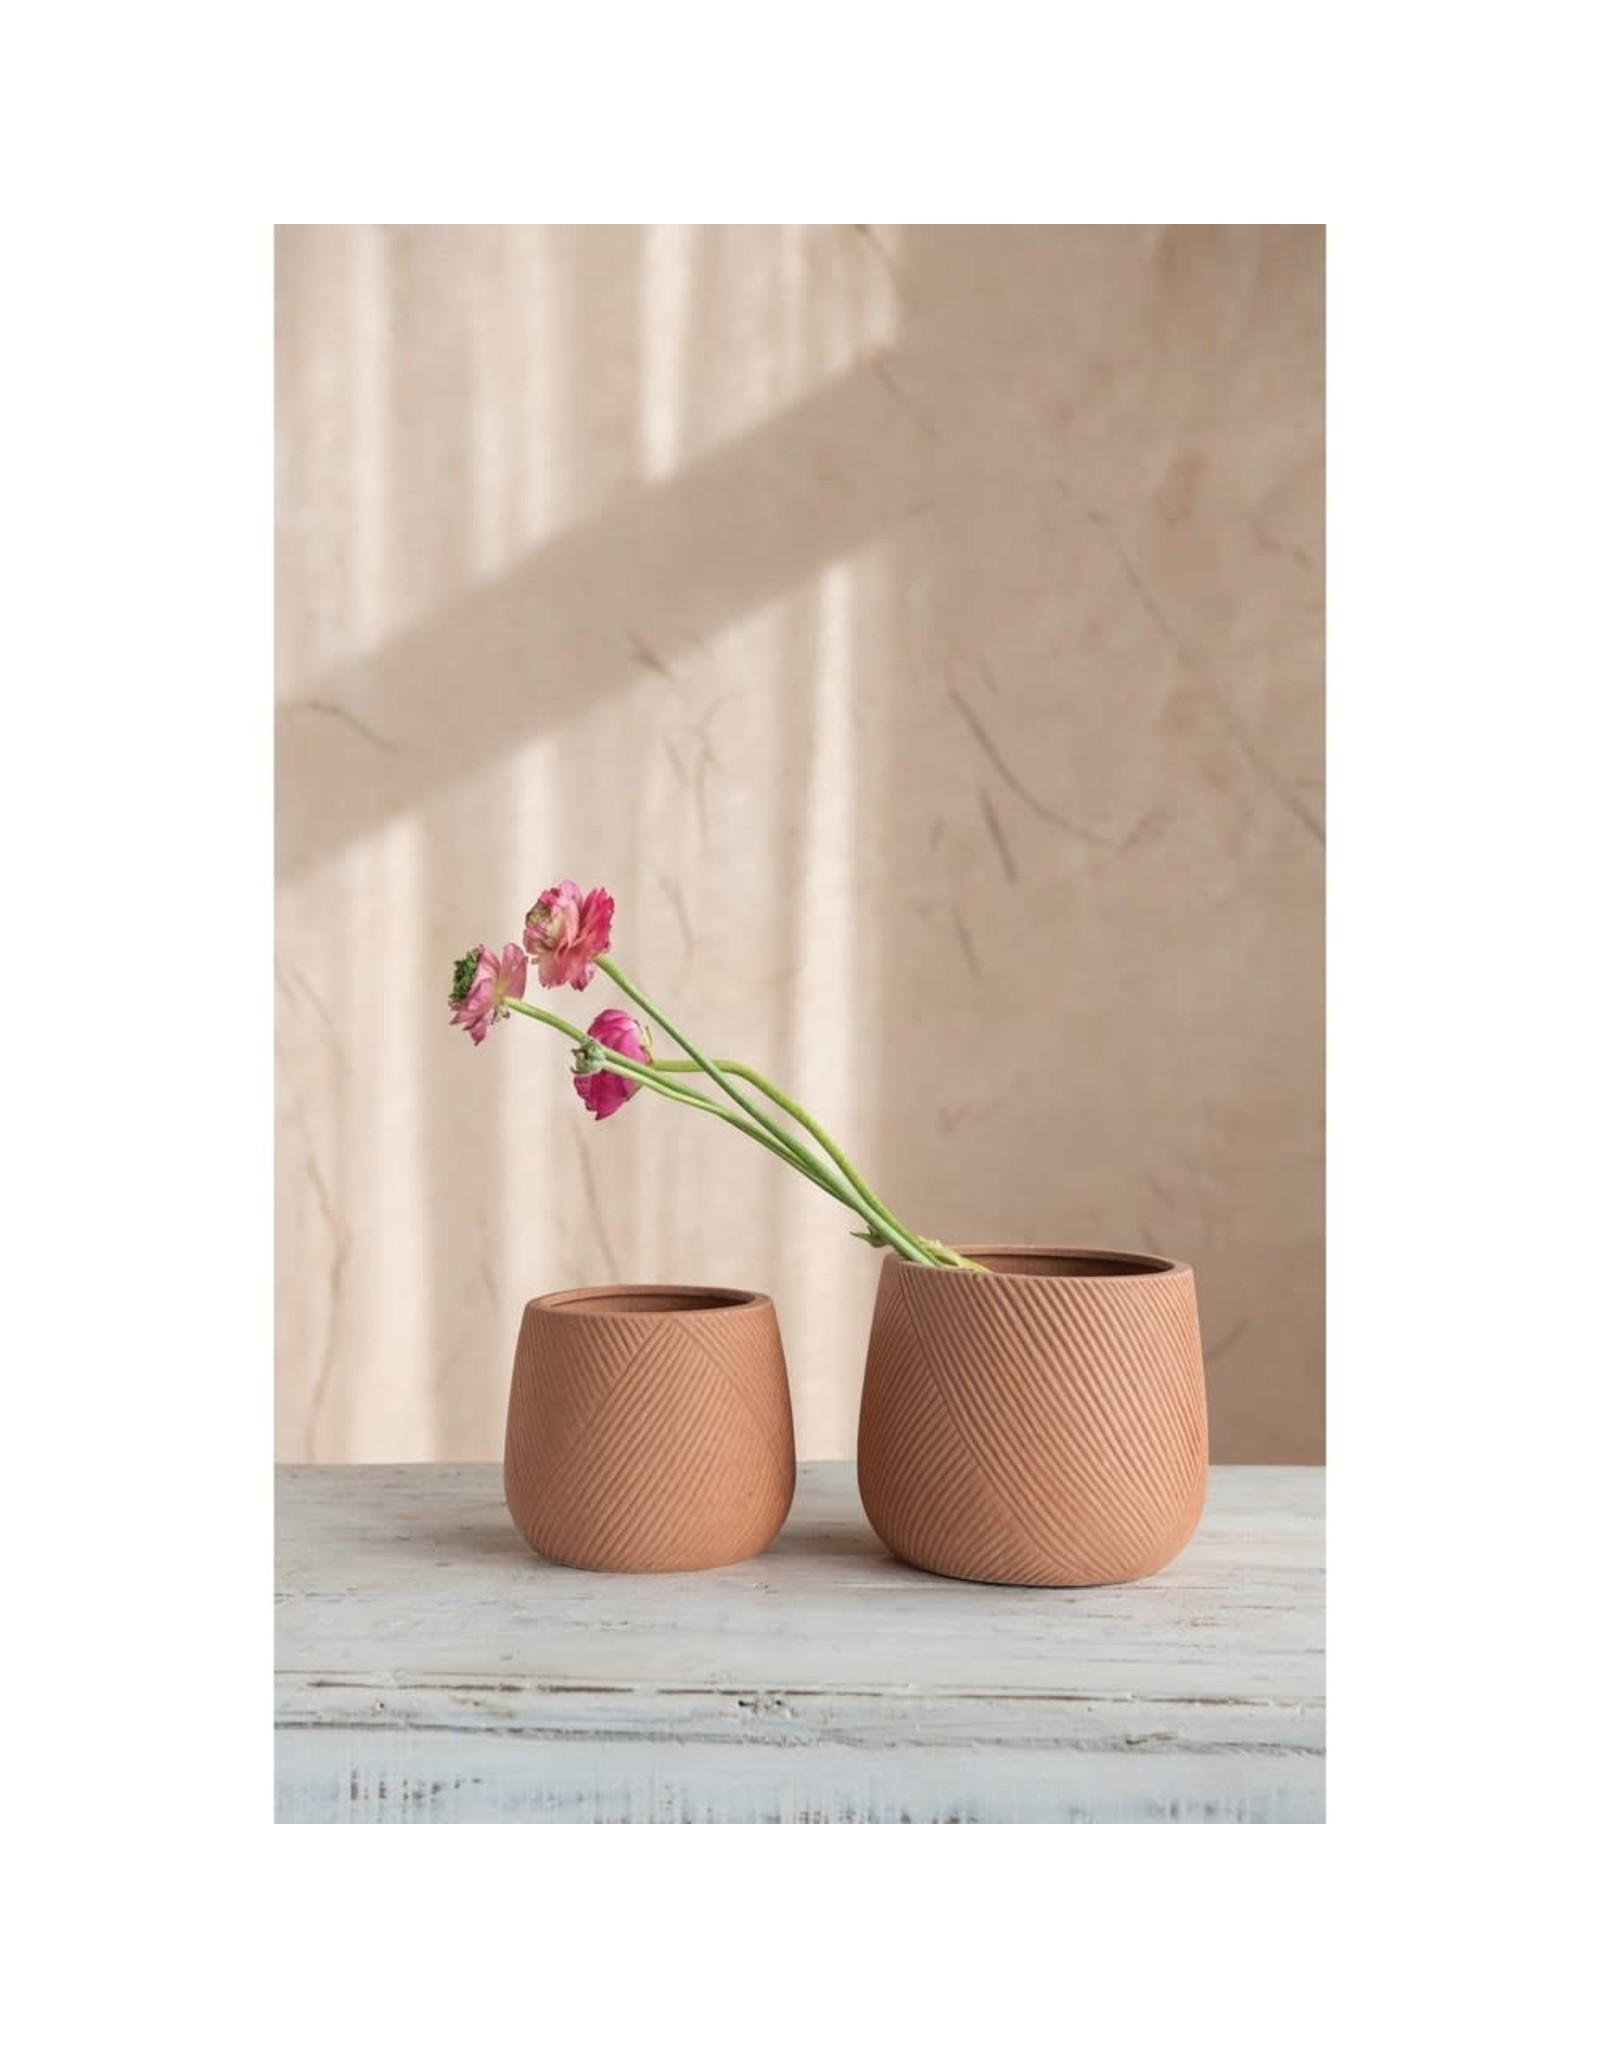 The Florist & The Merchant Engraved Stone  Planter, Terra-cotta Color